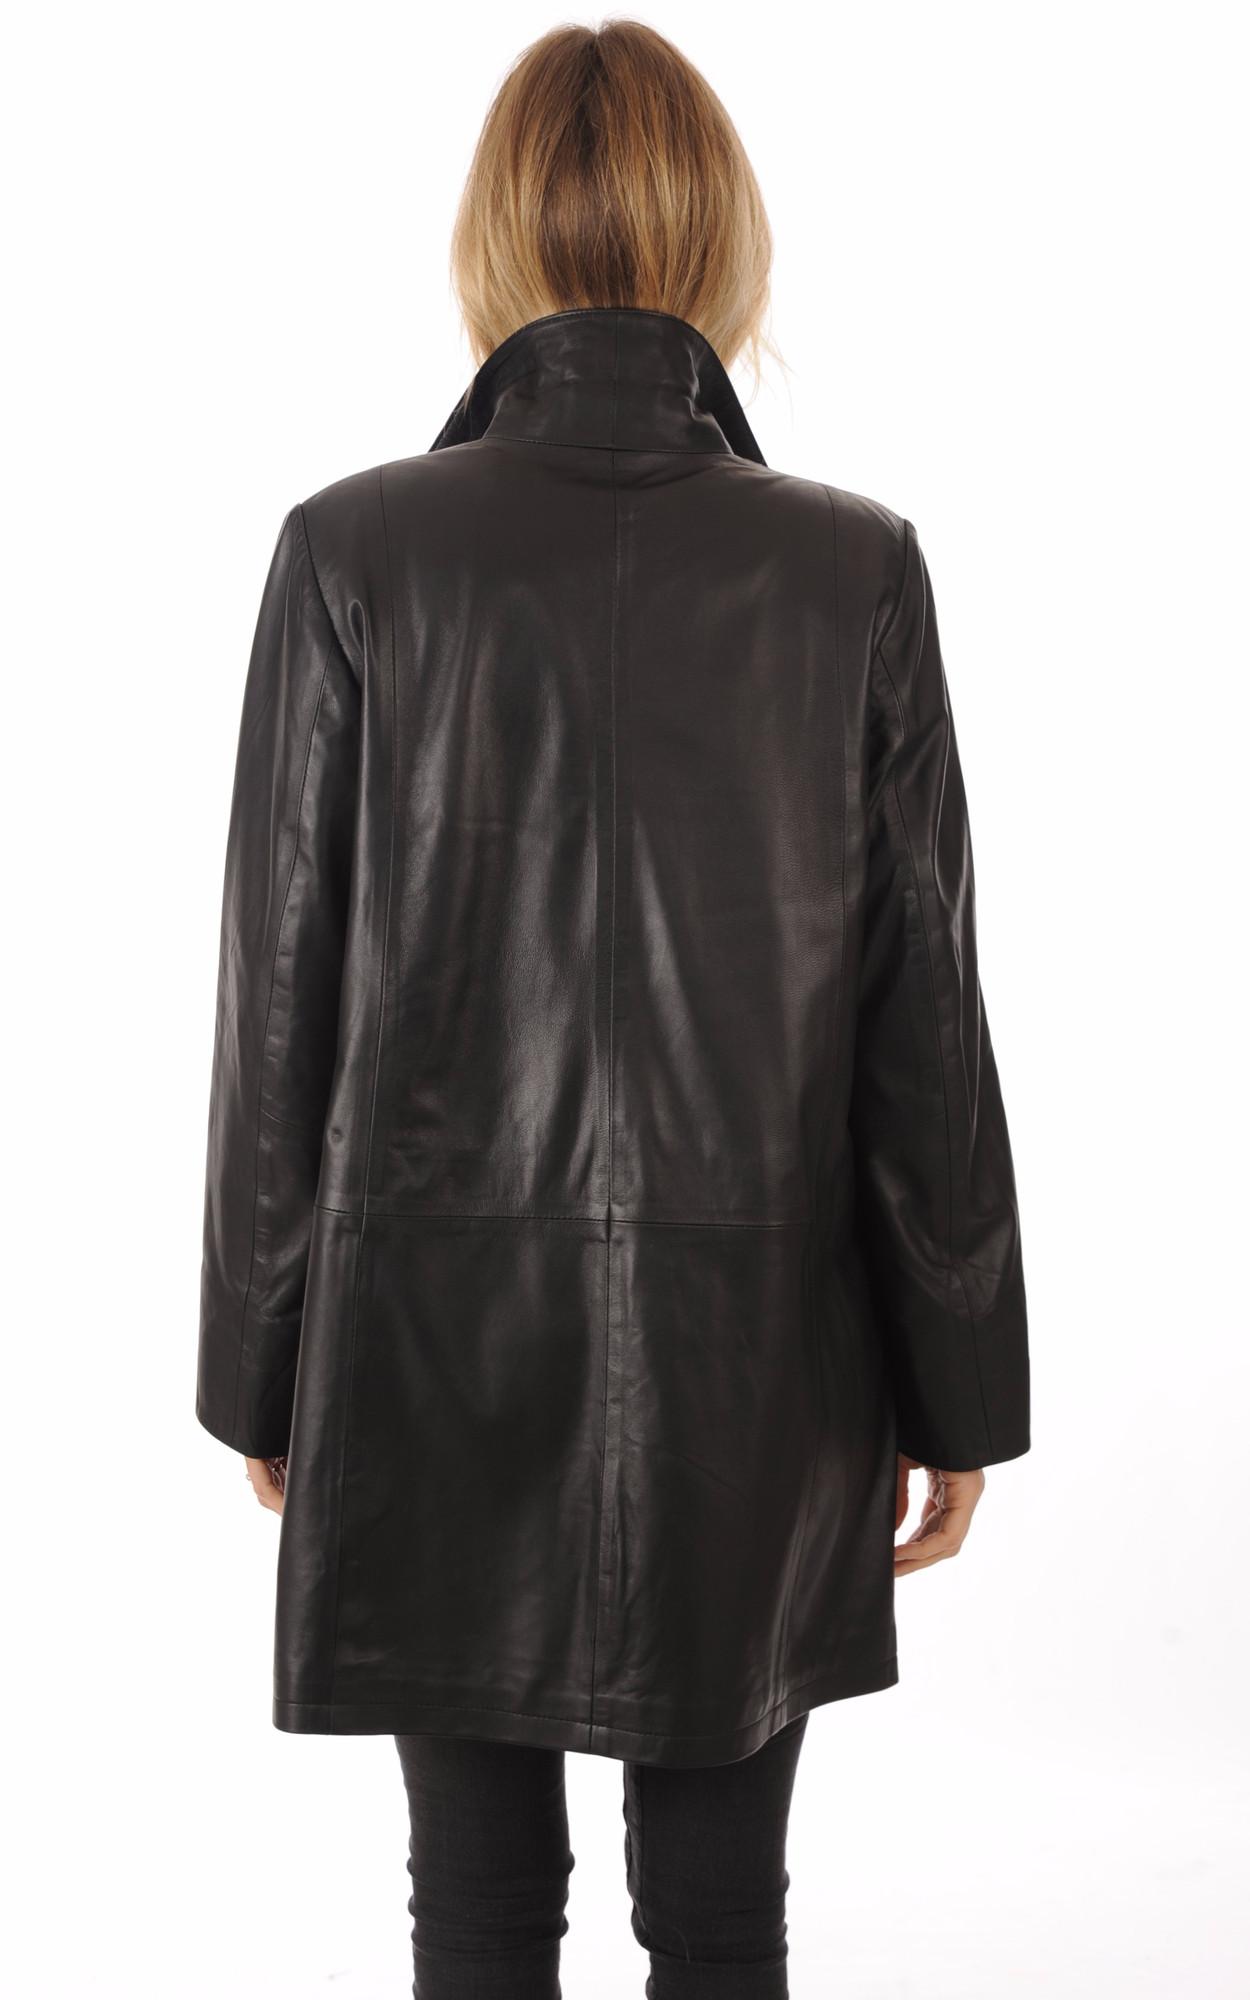 Veste Longue Cuir Grande Taille